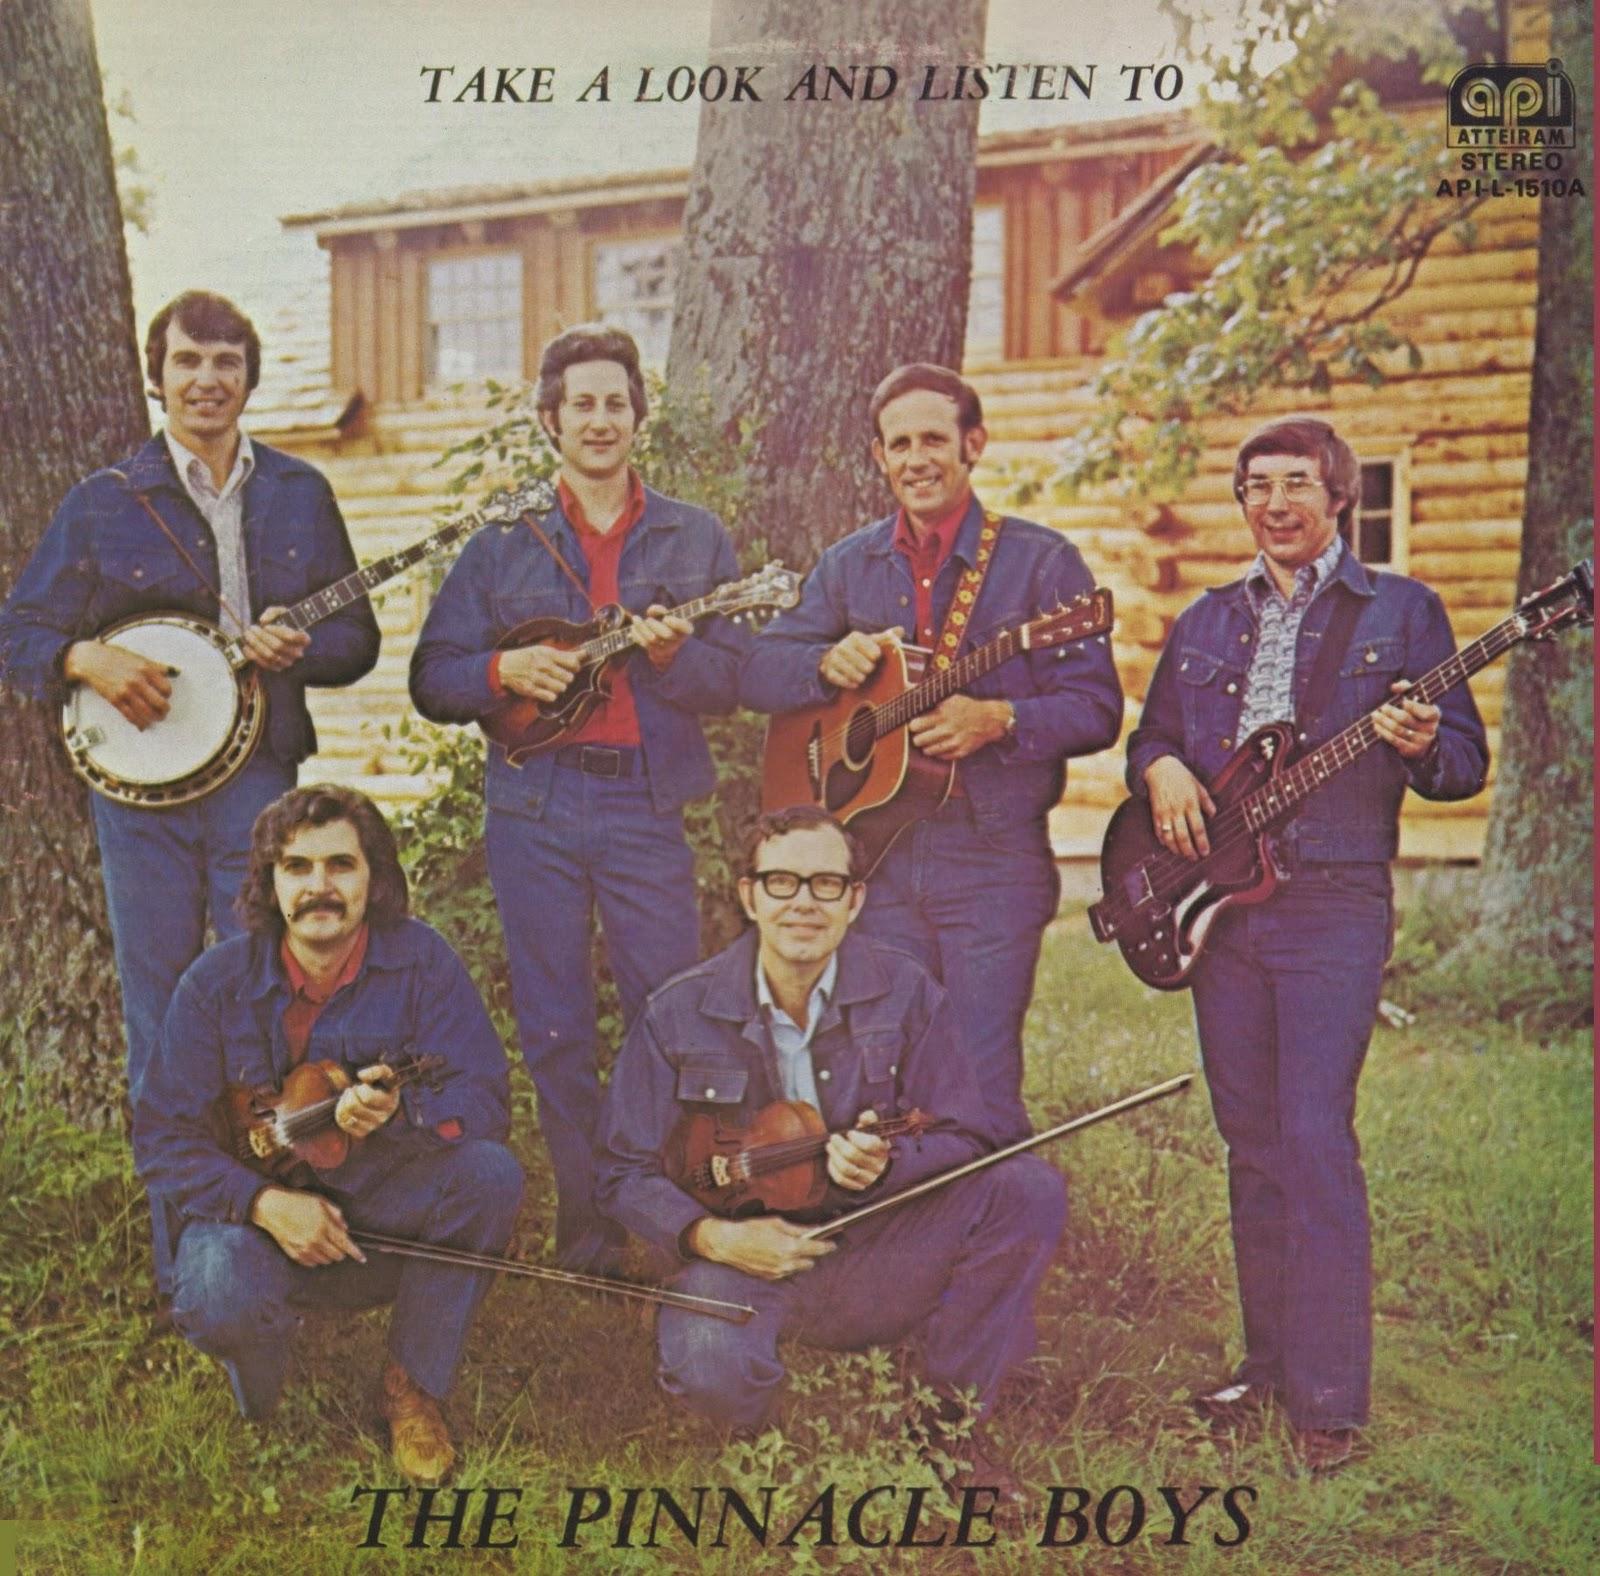 The Pinnacle Boys - The Pinnacle Boys